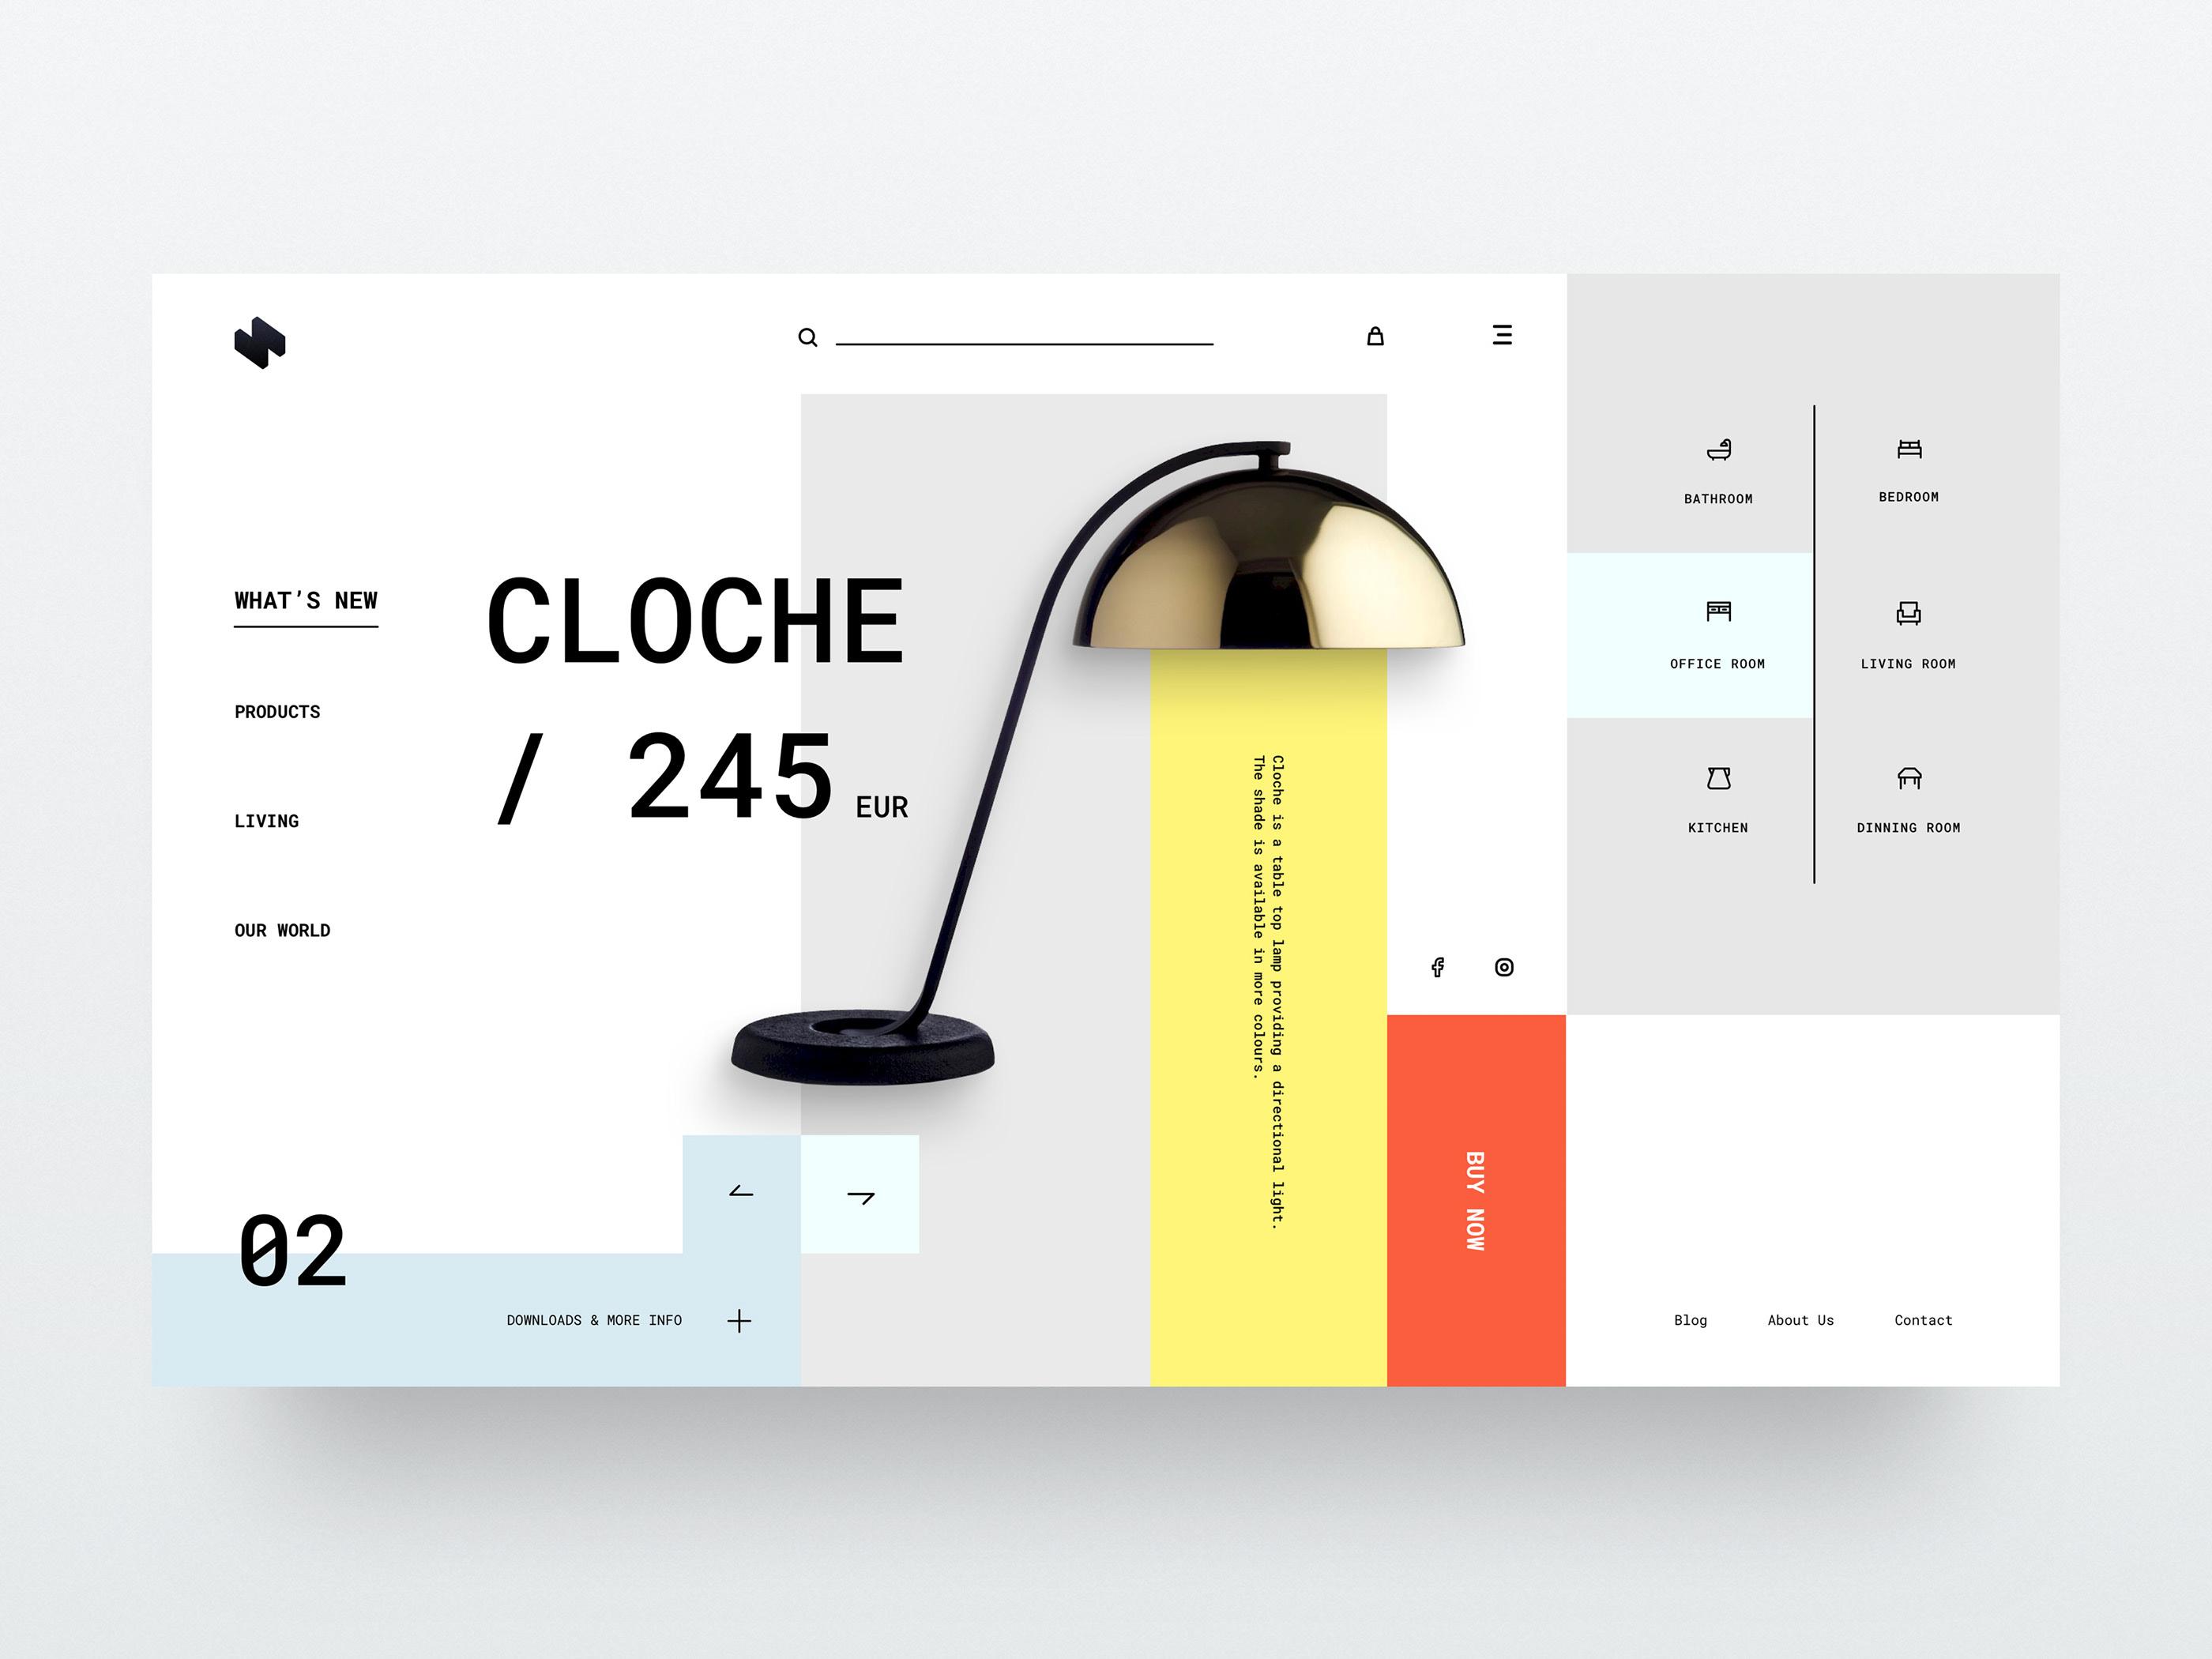 HeaderZ - Free UI Kit - 20 Free Headers to kickstart your next web design project.